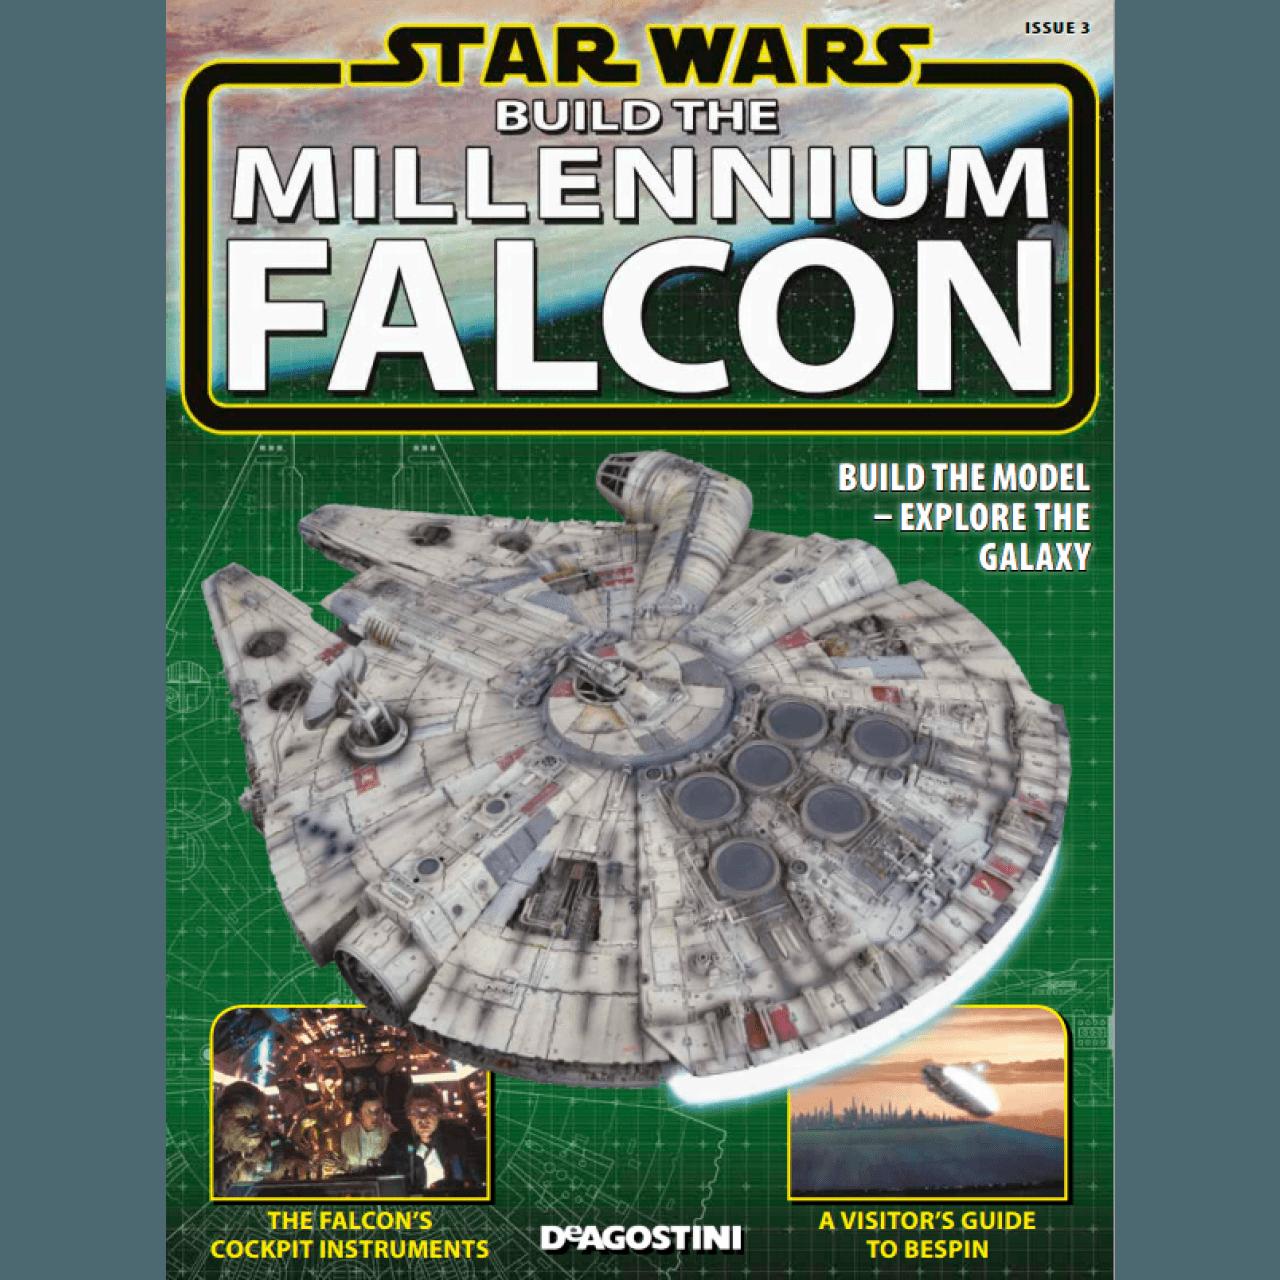 build star wars millennium falcon model modelspace rh model space com North American Falcons Falcon Guide Tinyurl